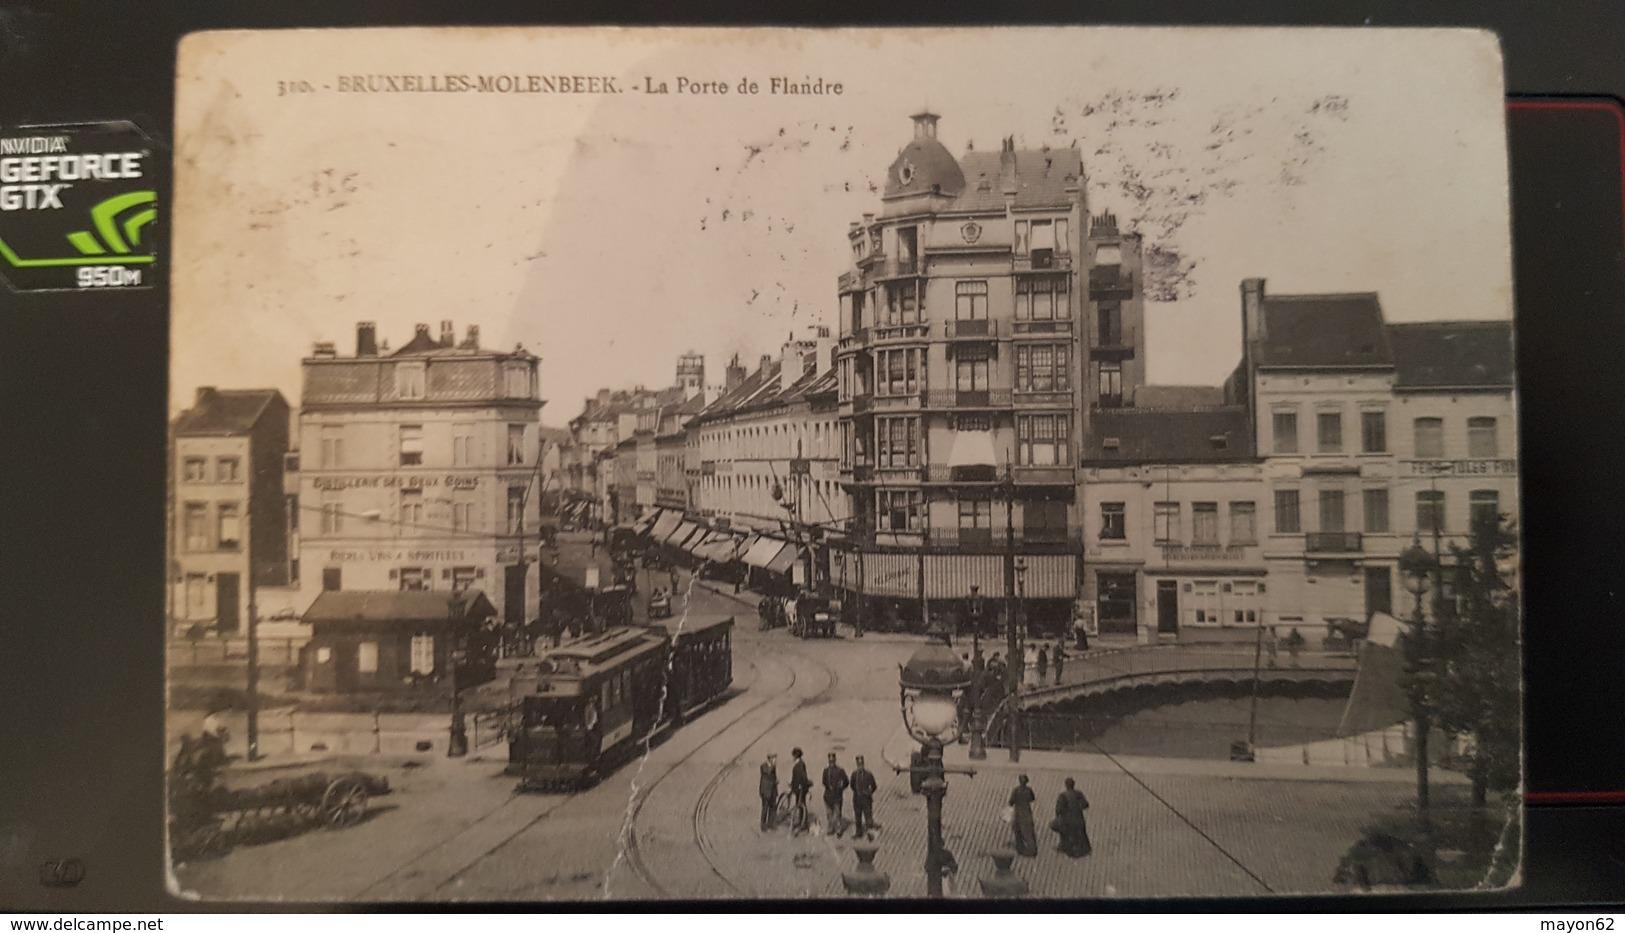 MOLENBEEK ST JEAN BRUXELLES  - LA PORTE DE FLANDRE - TRES ANIMEE TRAM TRAMWAY - Molenbeek-St-Jean - St-Jans-Molenbeek